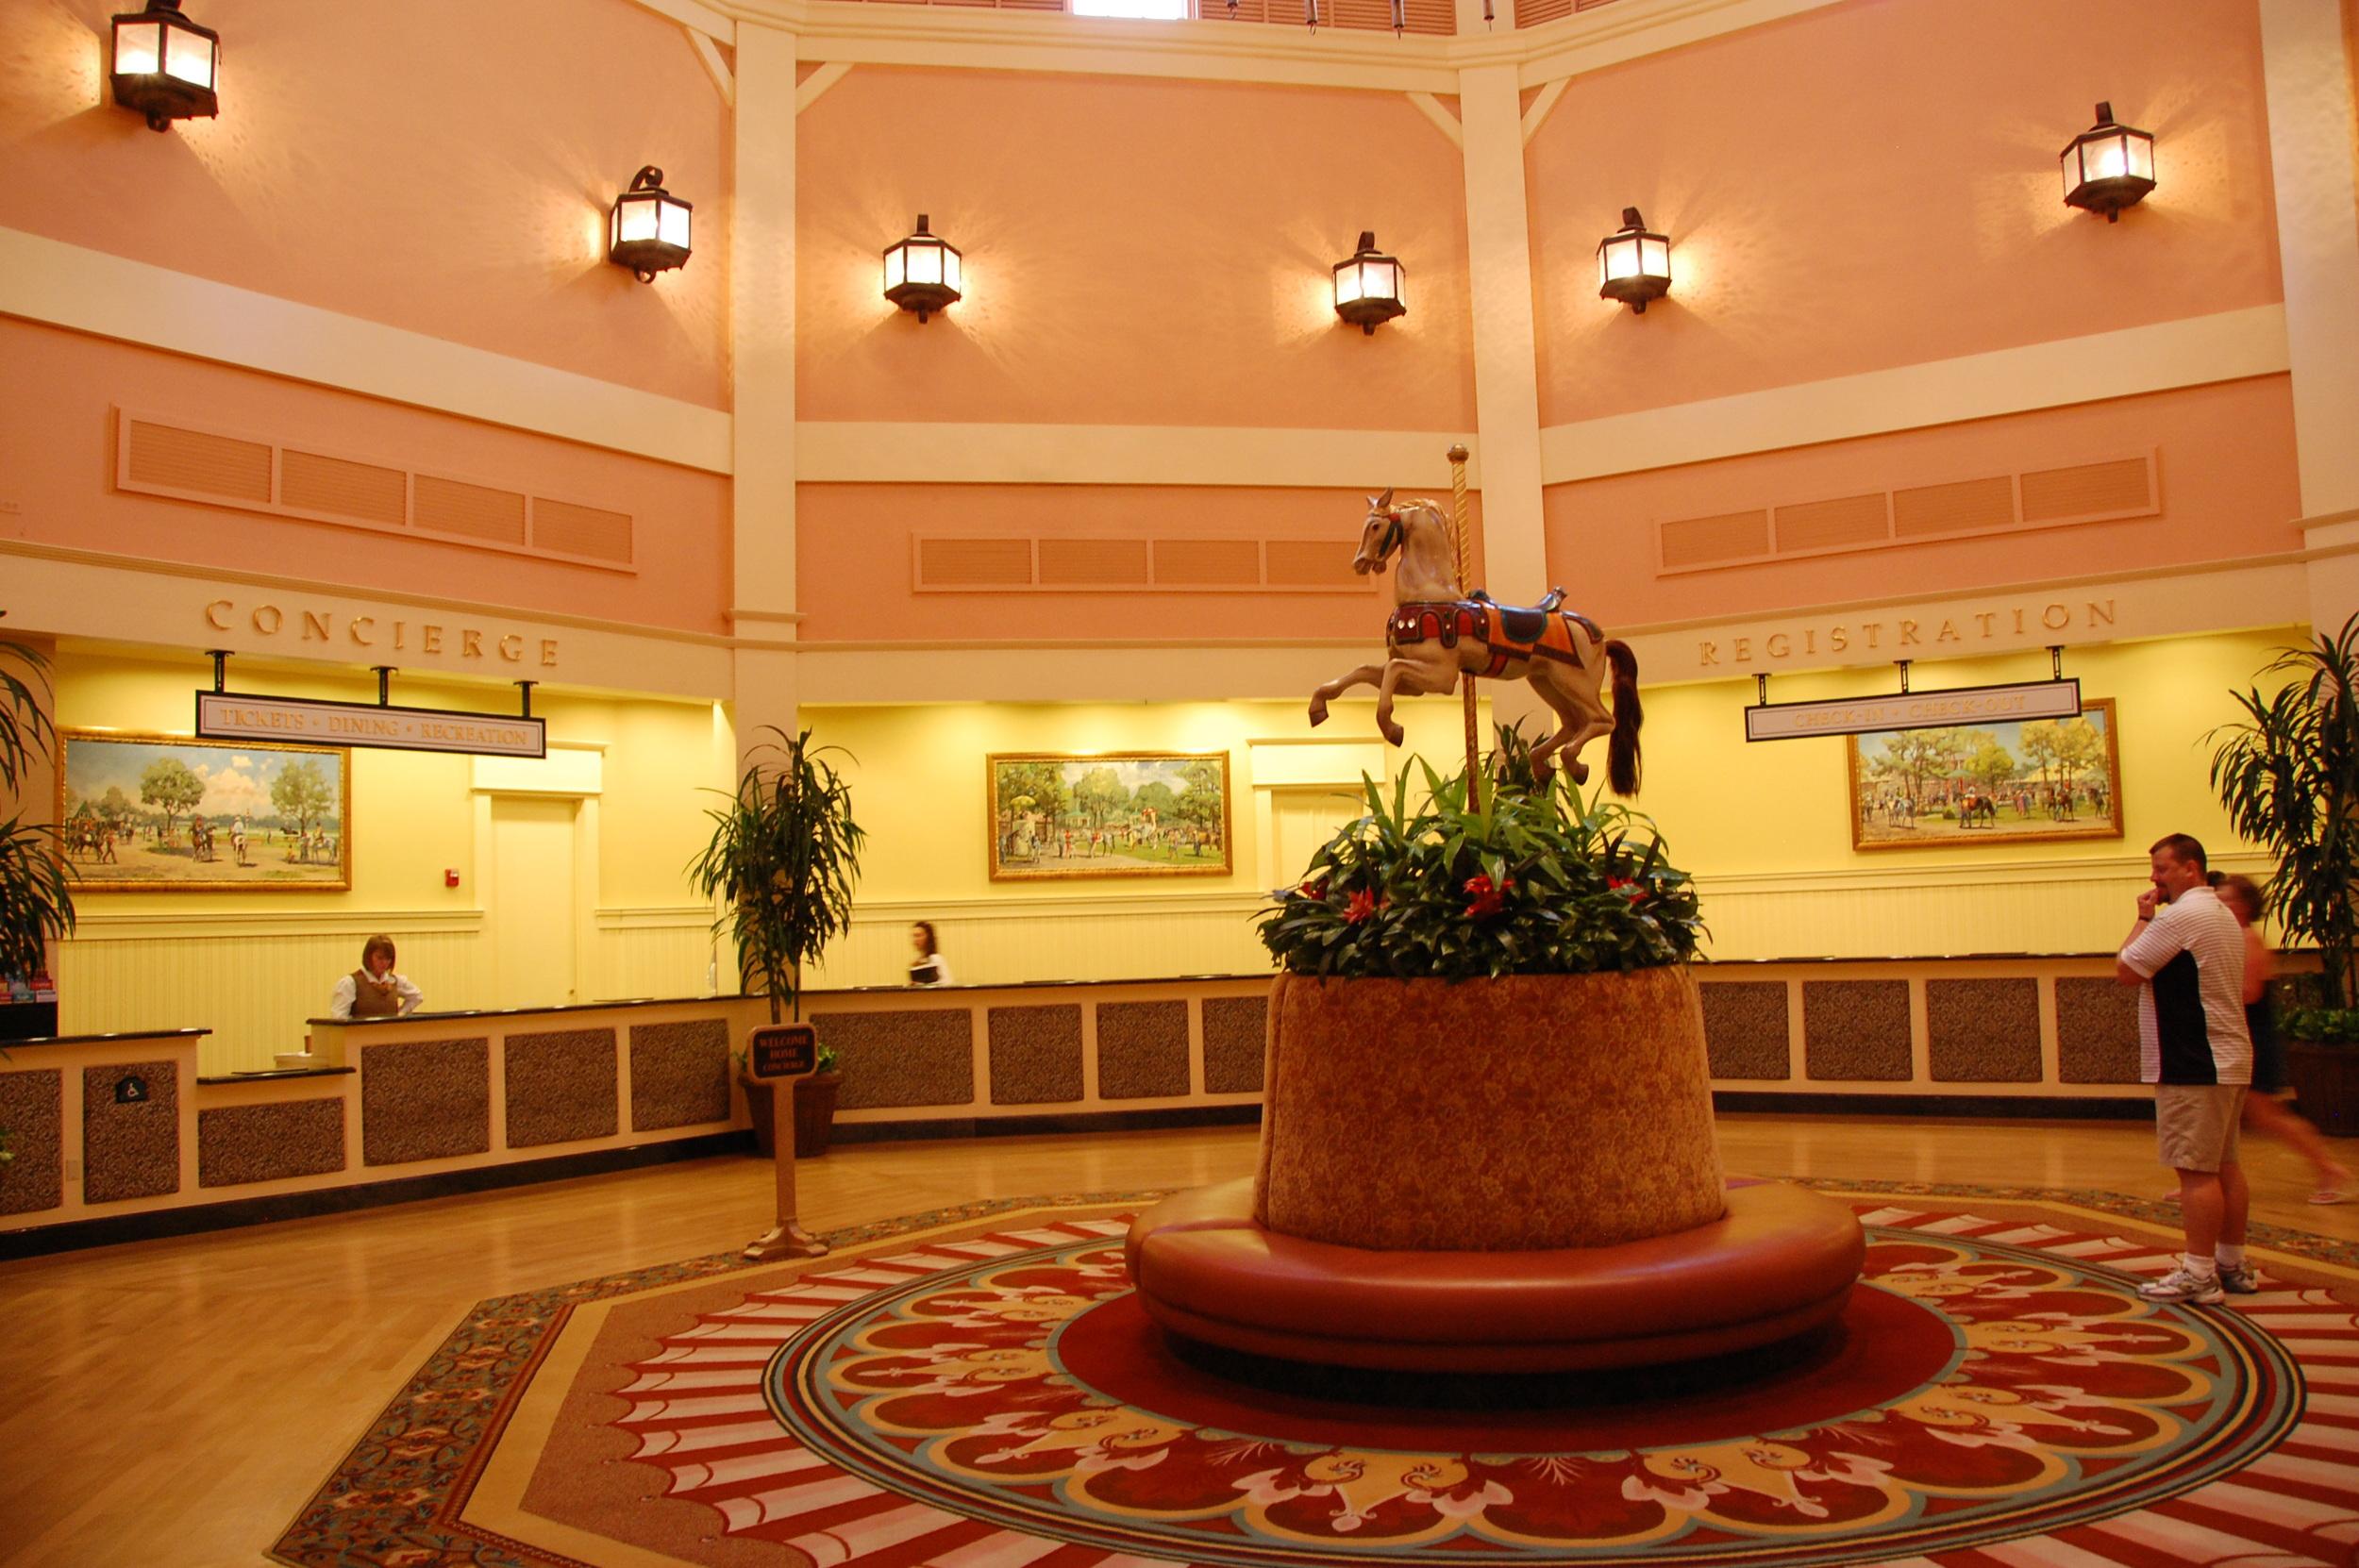 Saratoga Springs Registration